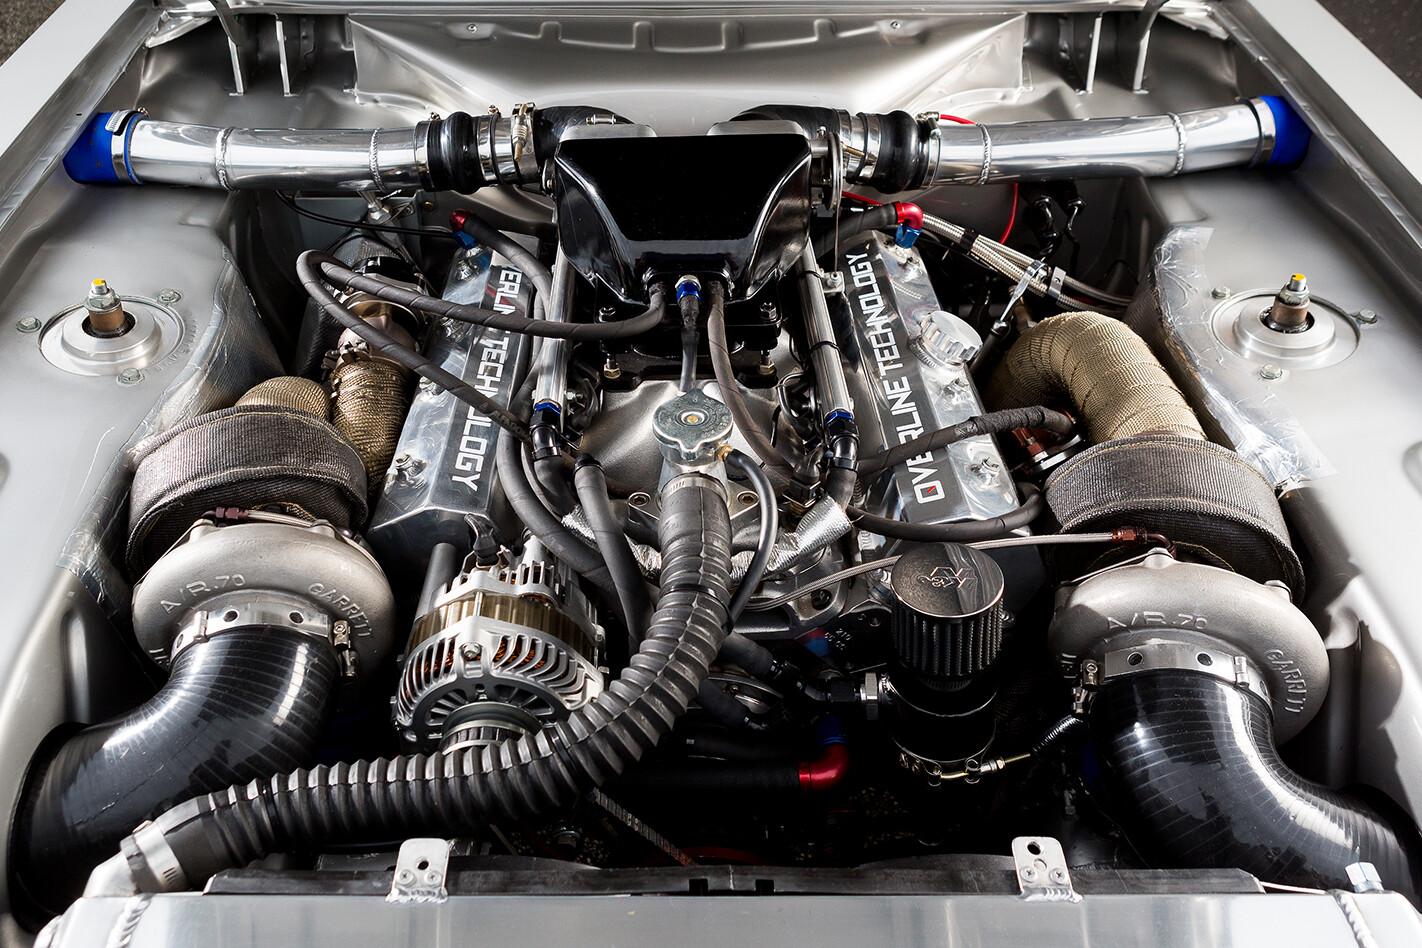 Ford -Capri -engine -bay